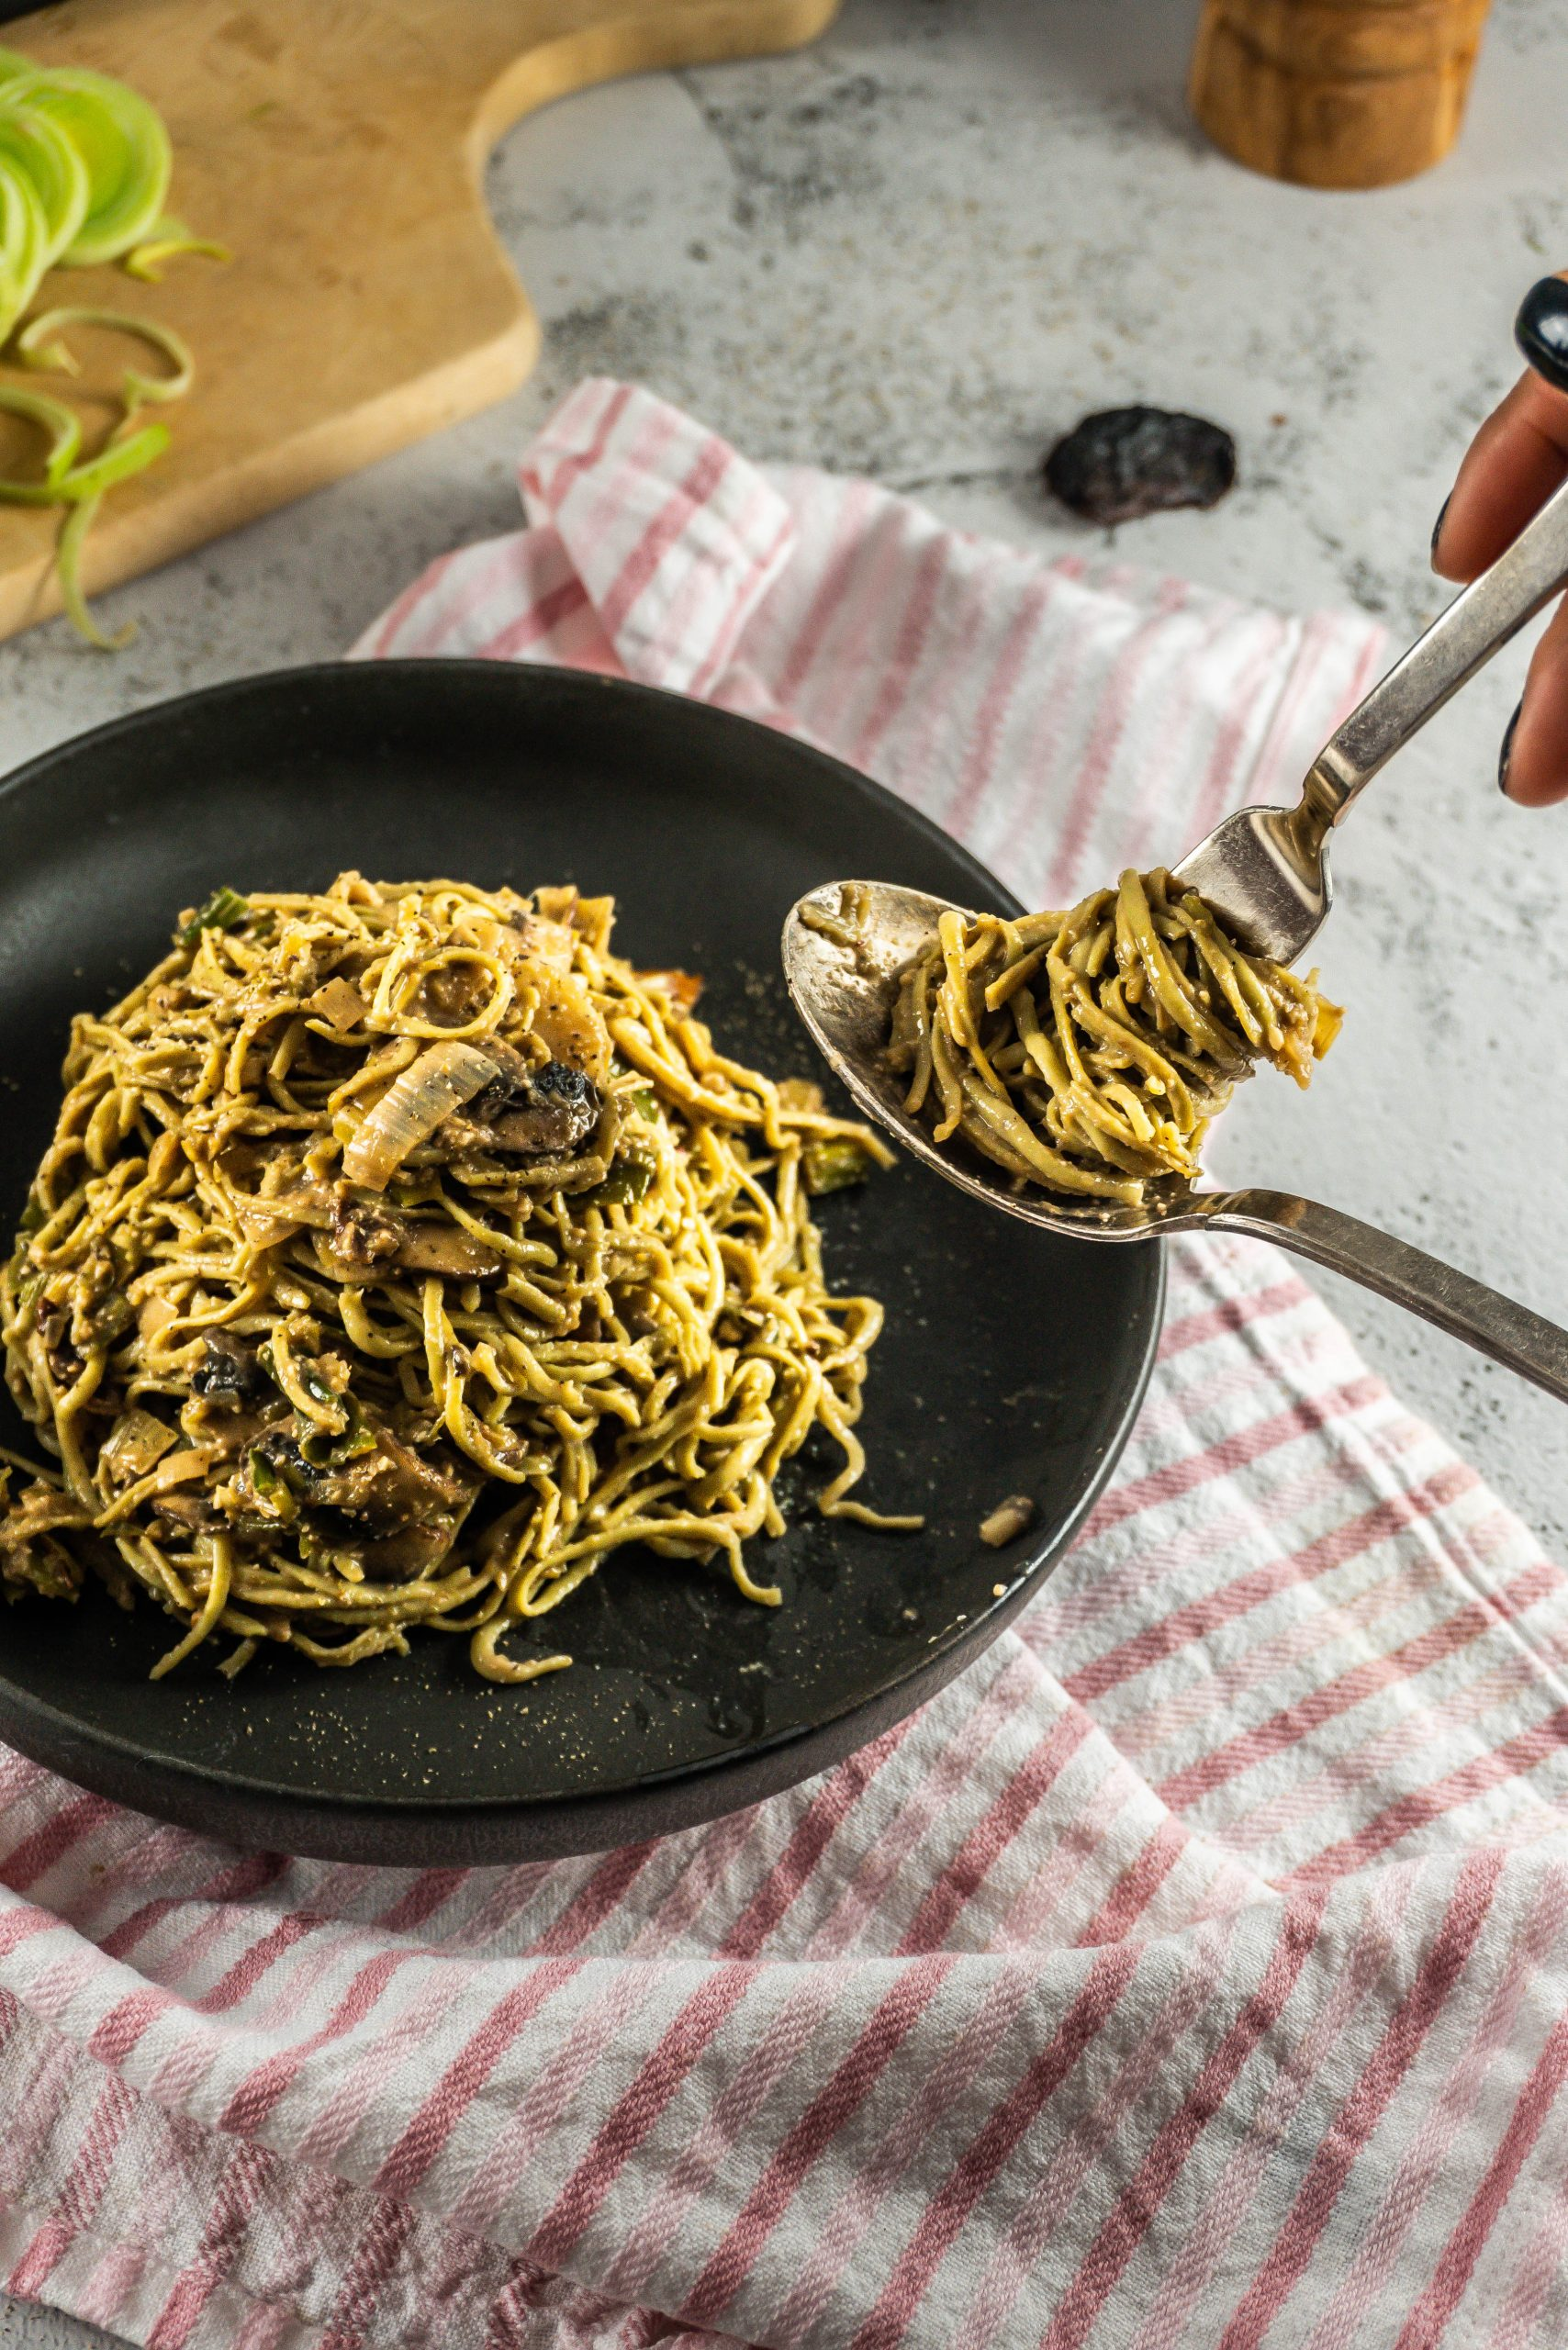 Creamy Mushroom and Leek Pasta being turned on a spoon